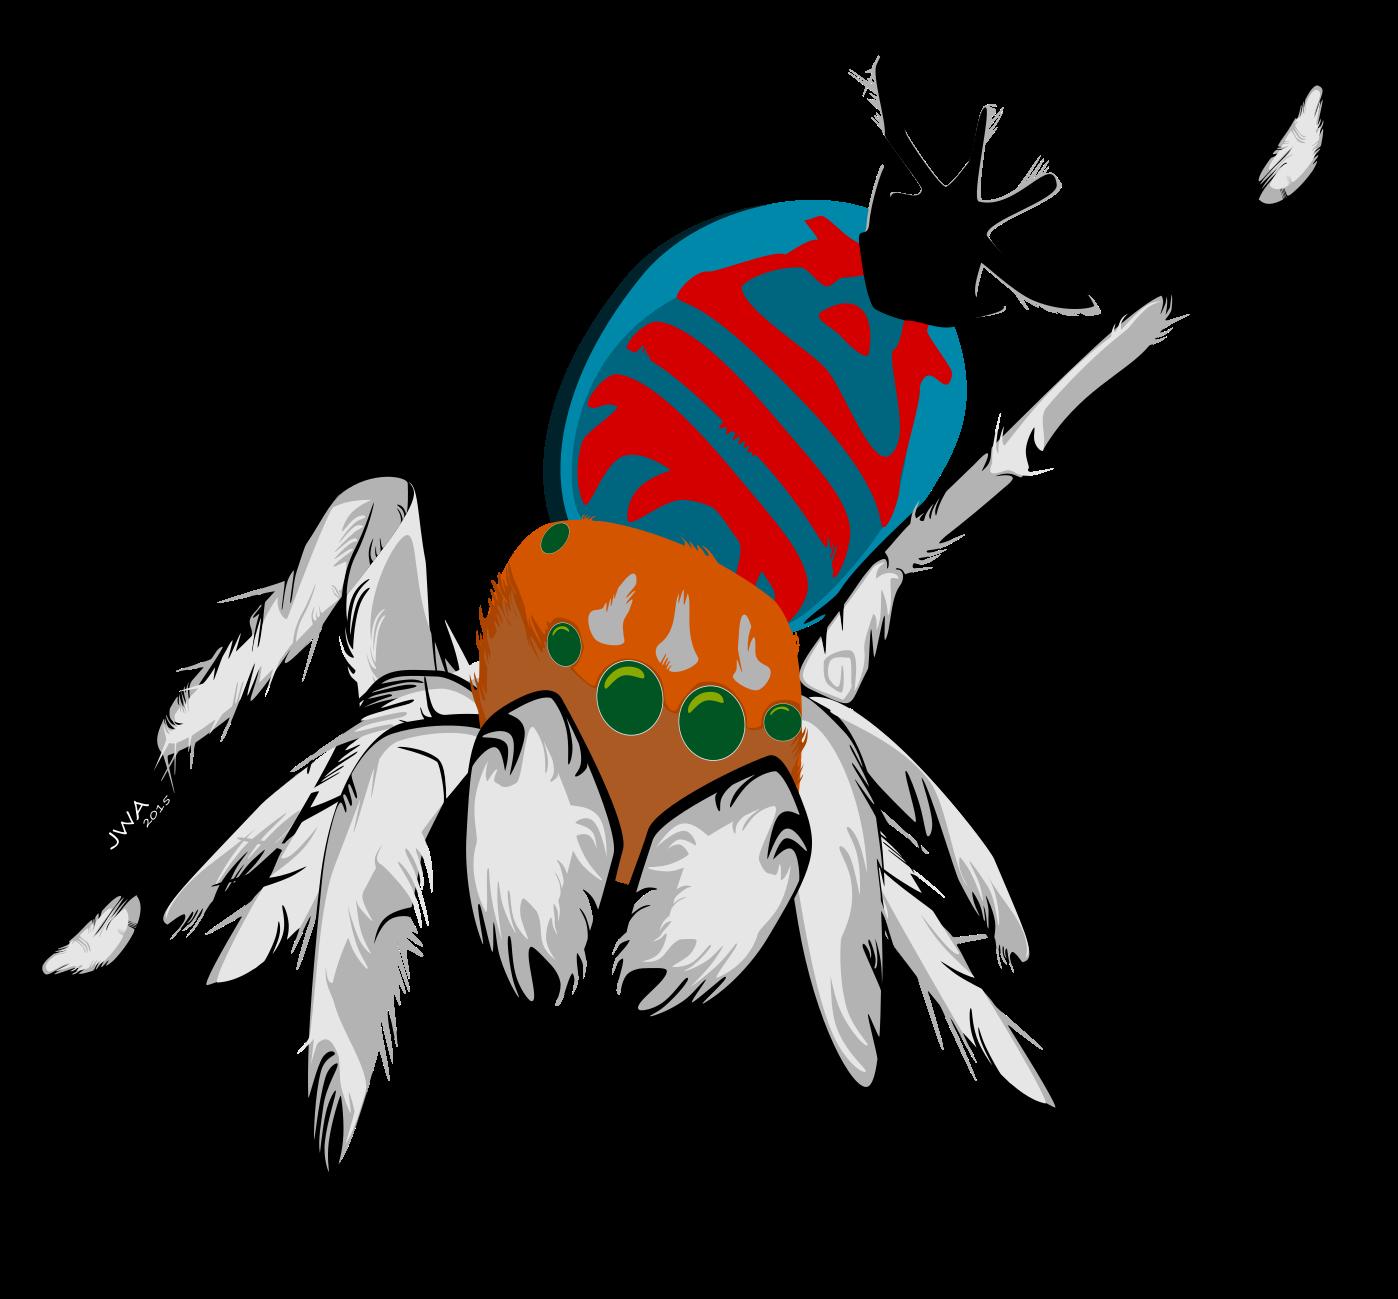 Peacock Jumping Spiders Jared Wilson Aggarwal